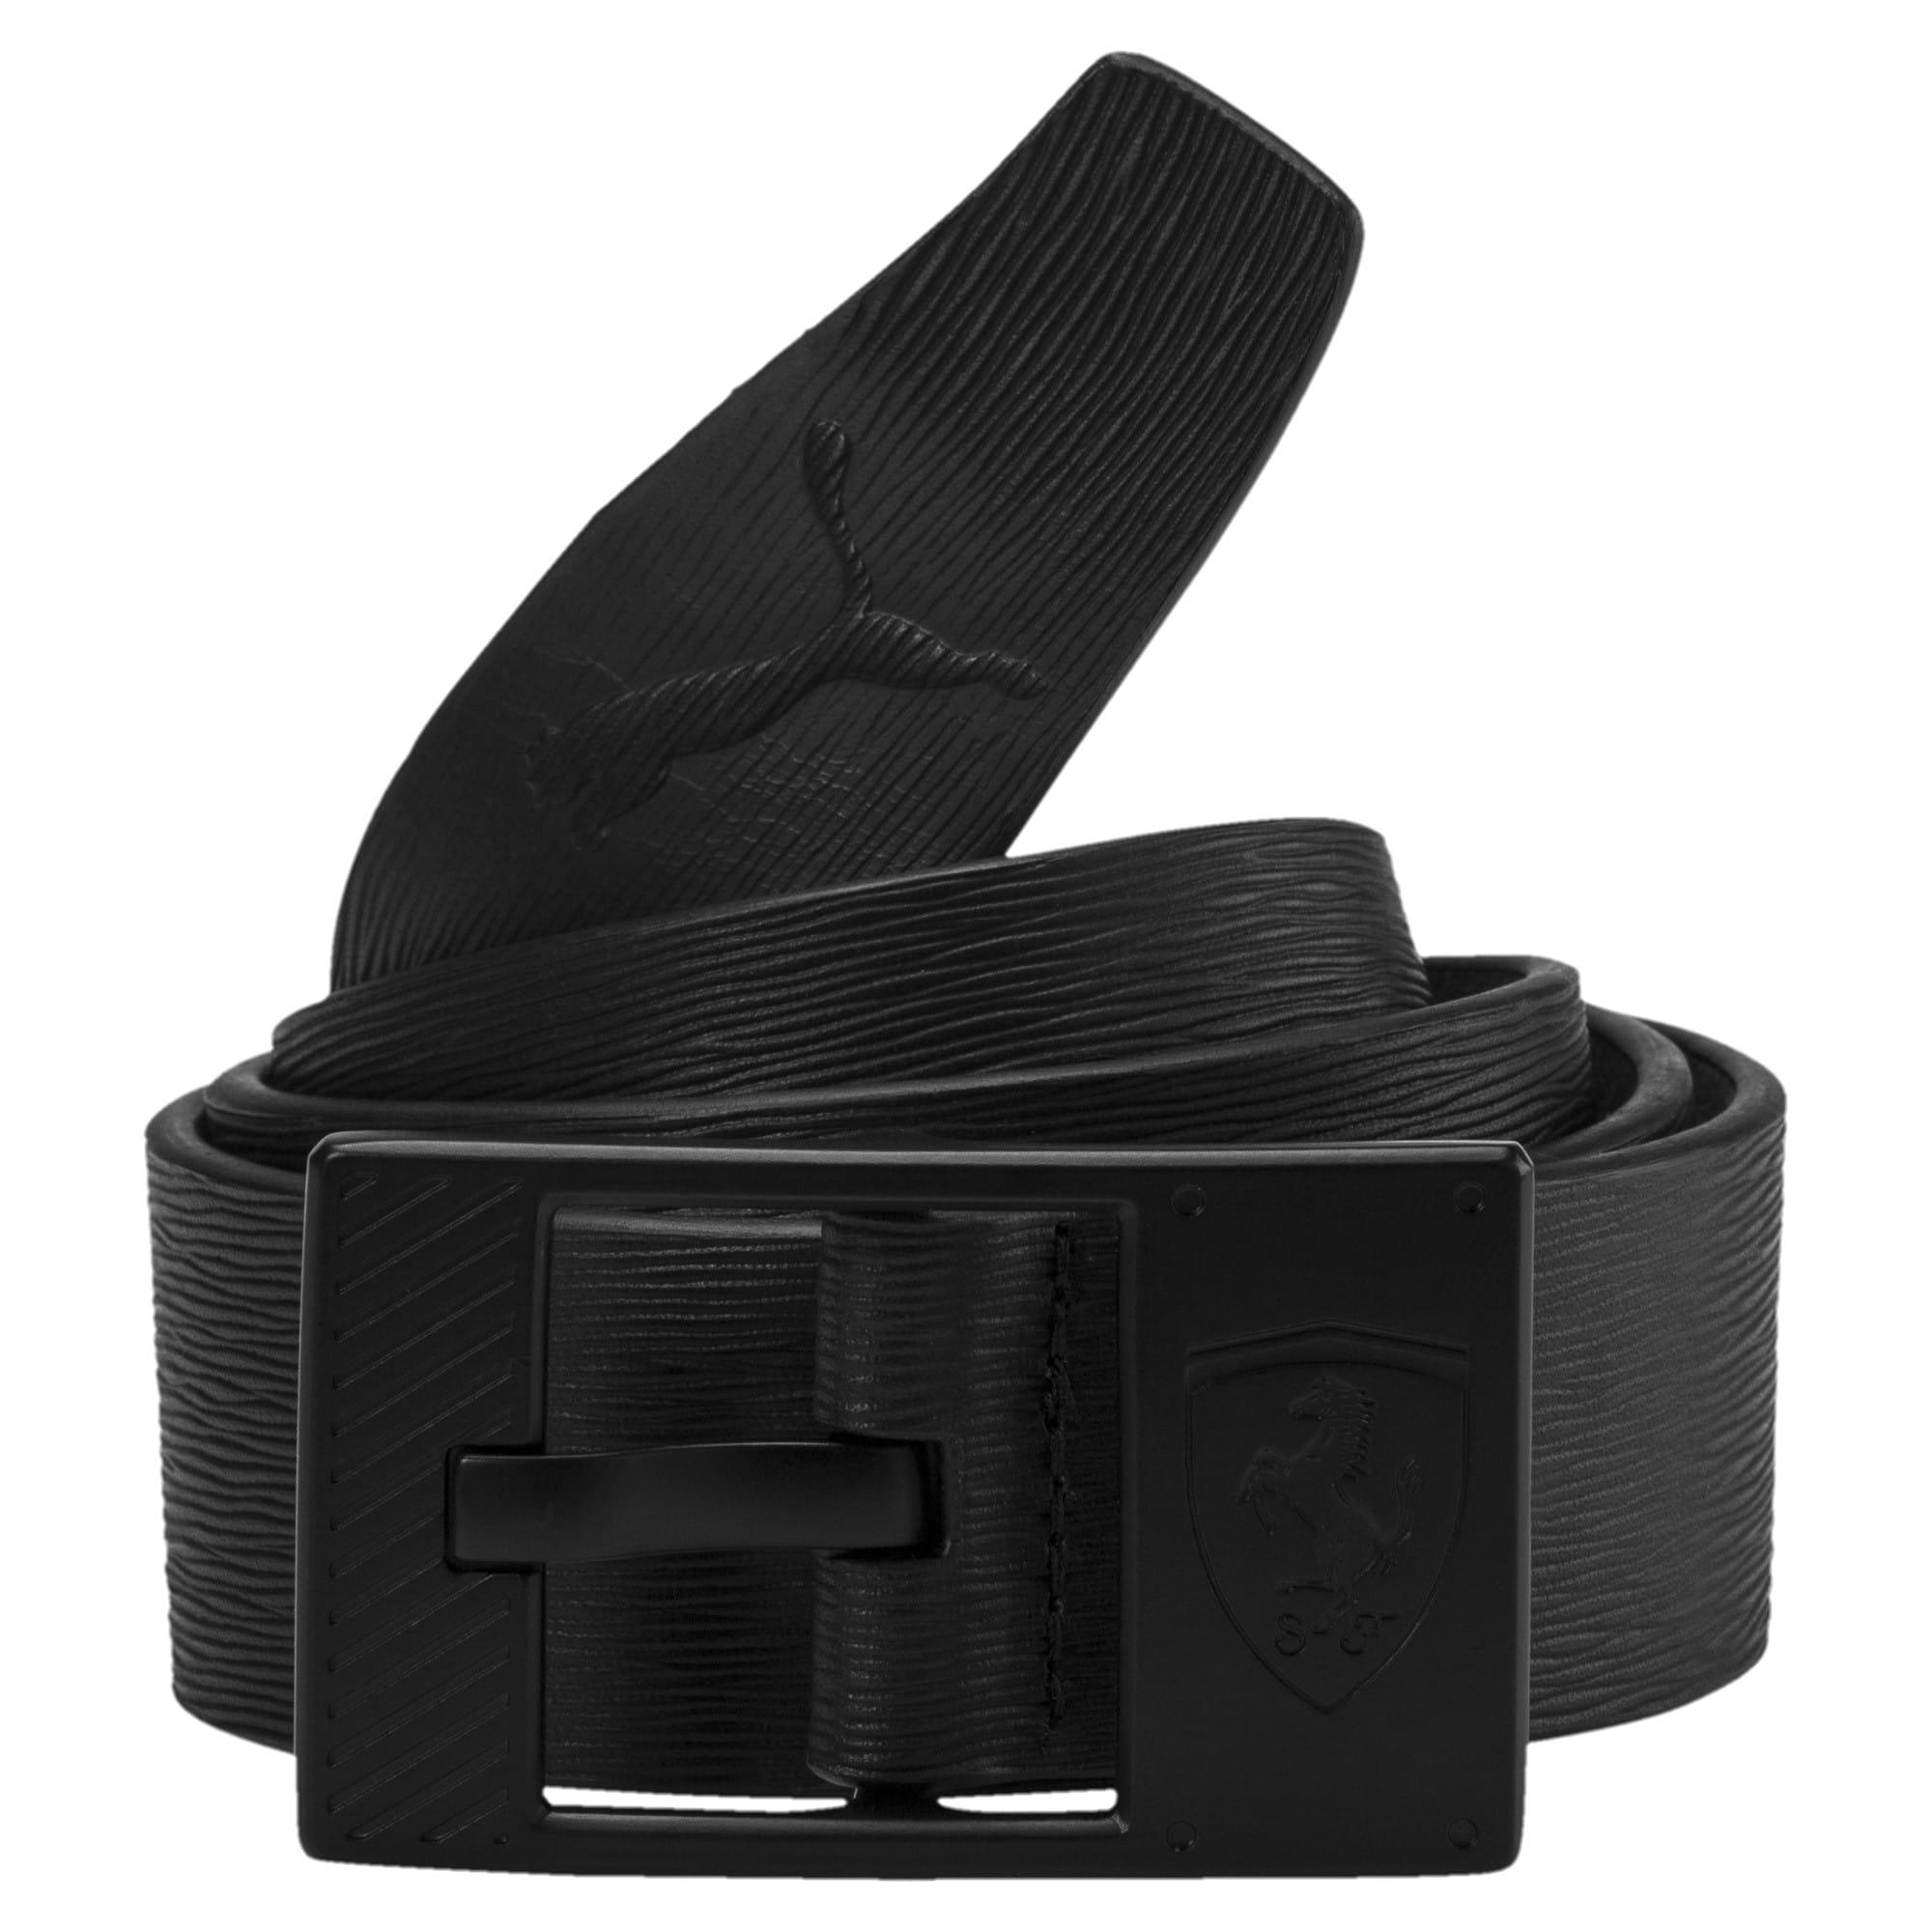 Thumbnail 1 of Ferrari Lifestyle Leather Belt, Puma Black, medium-IND